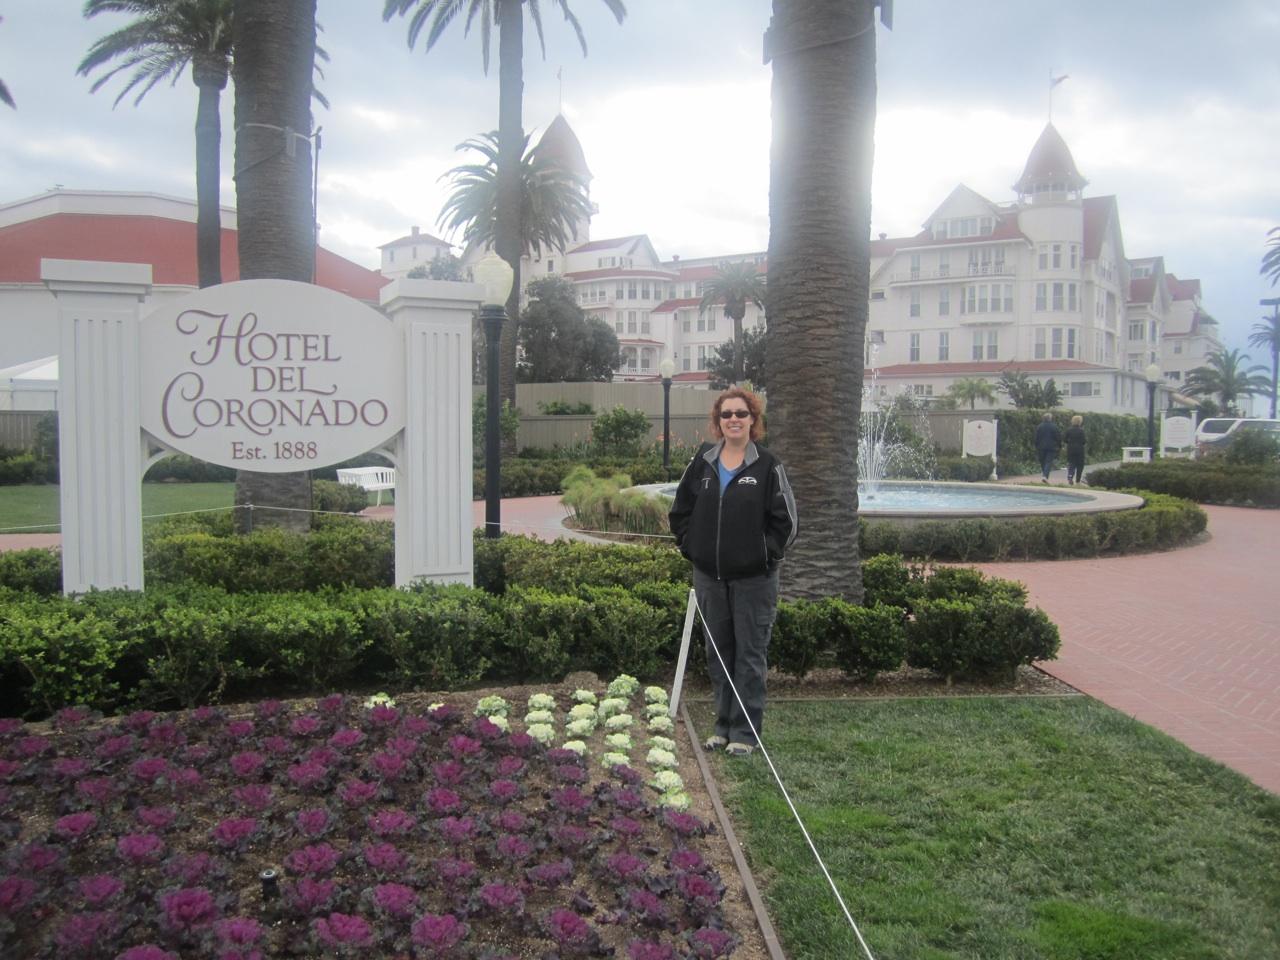 Brenda Standing In Front Of The Hotel del Coronado